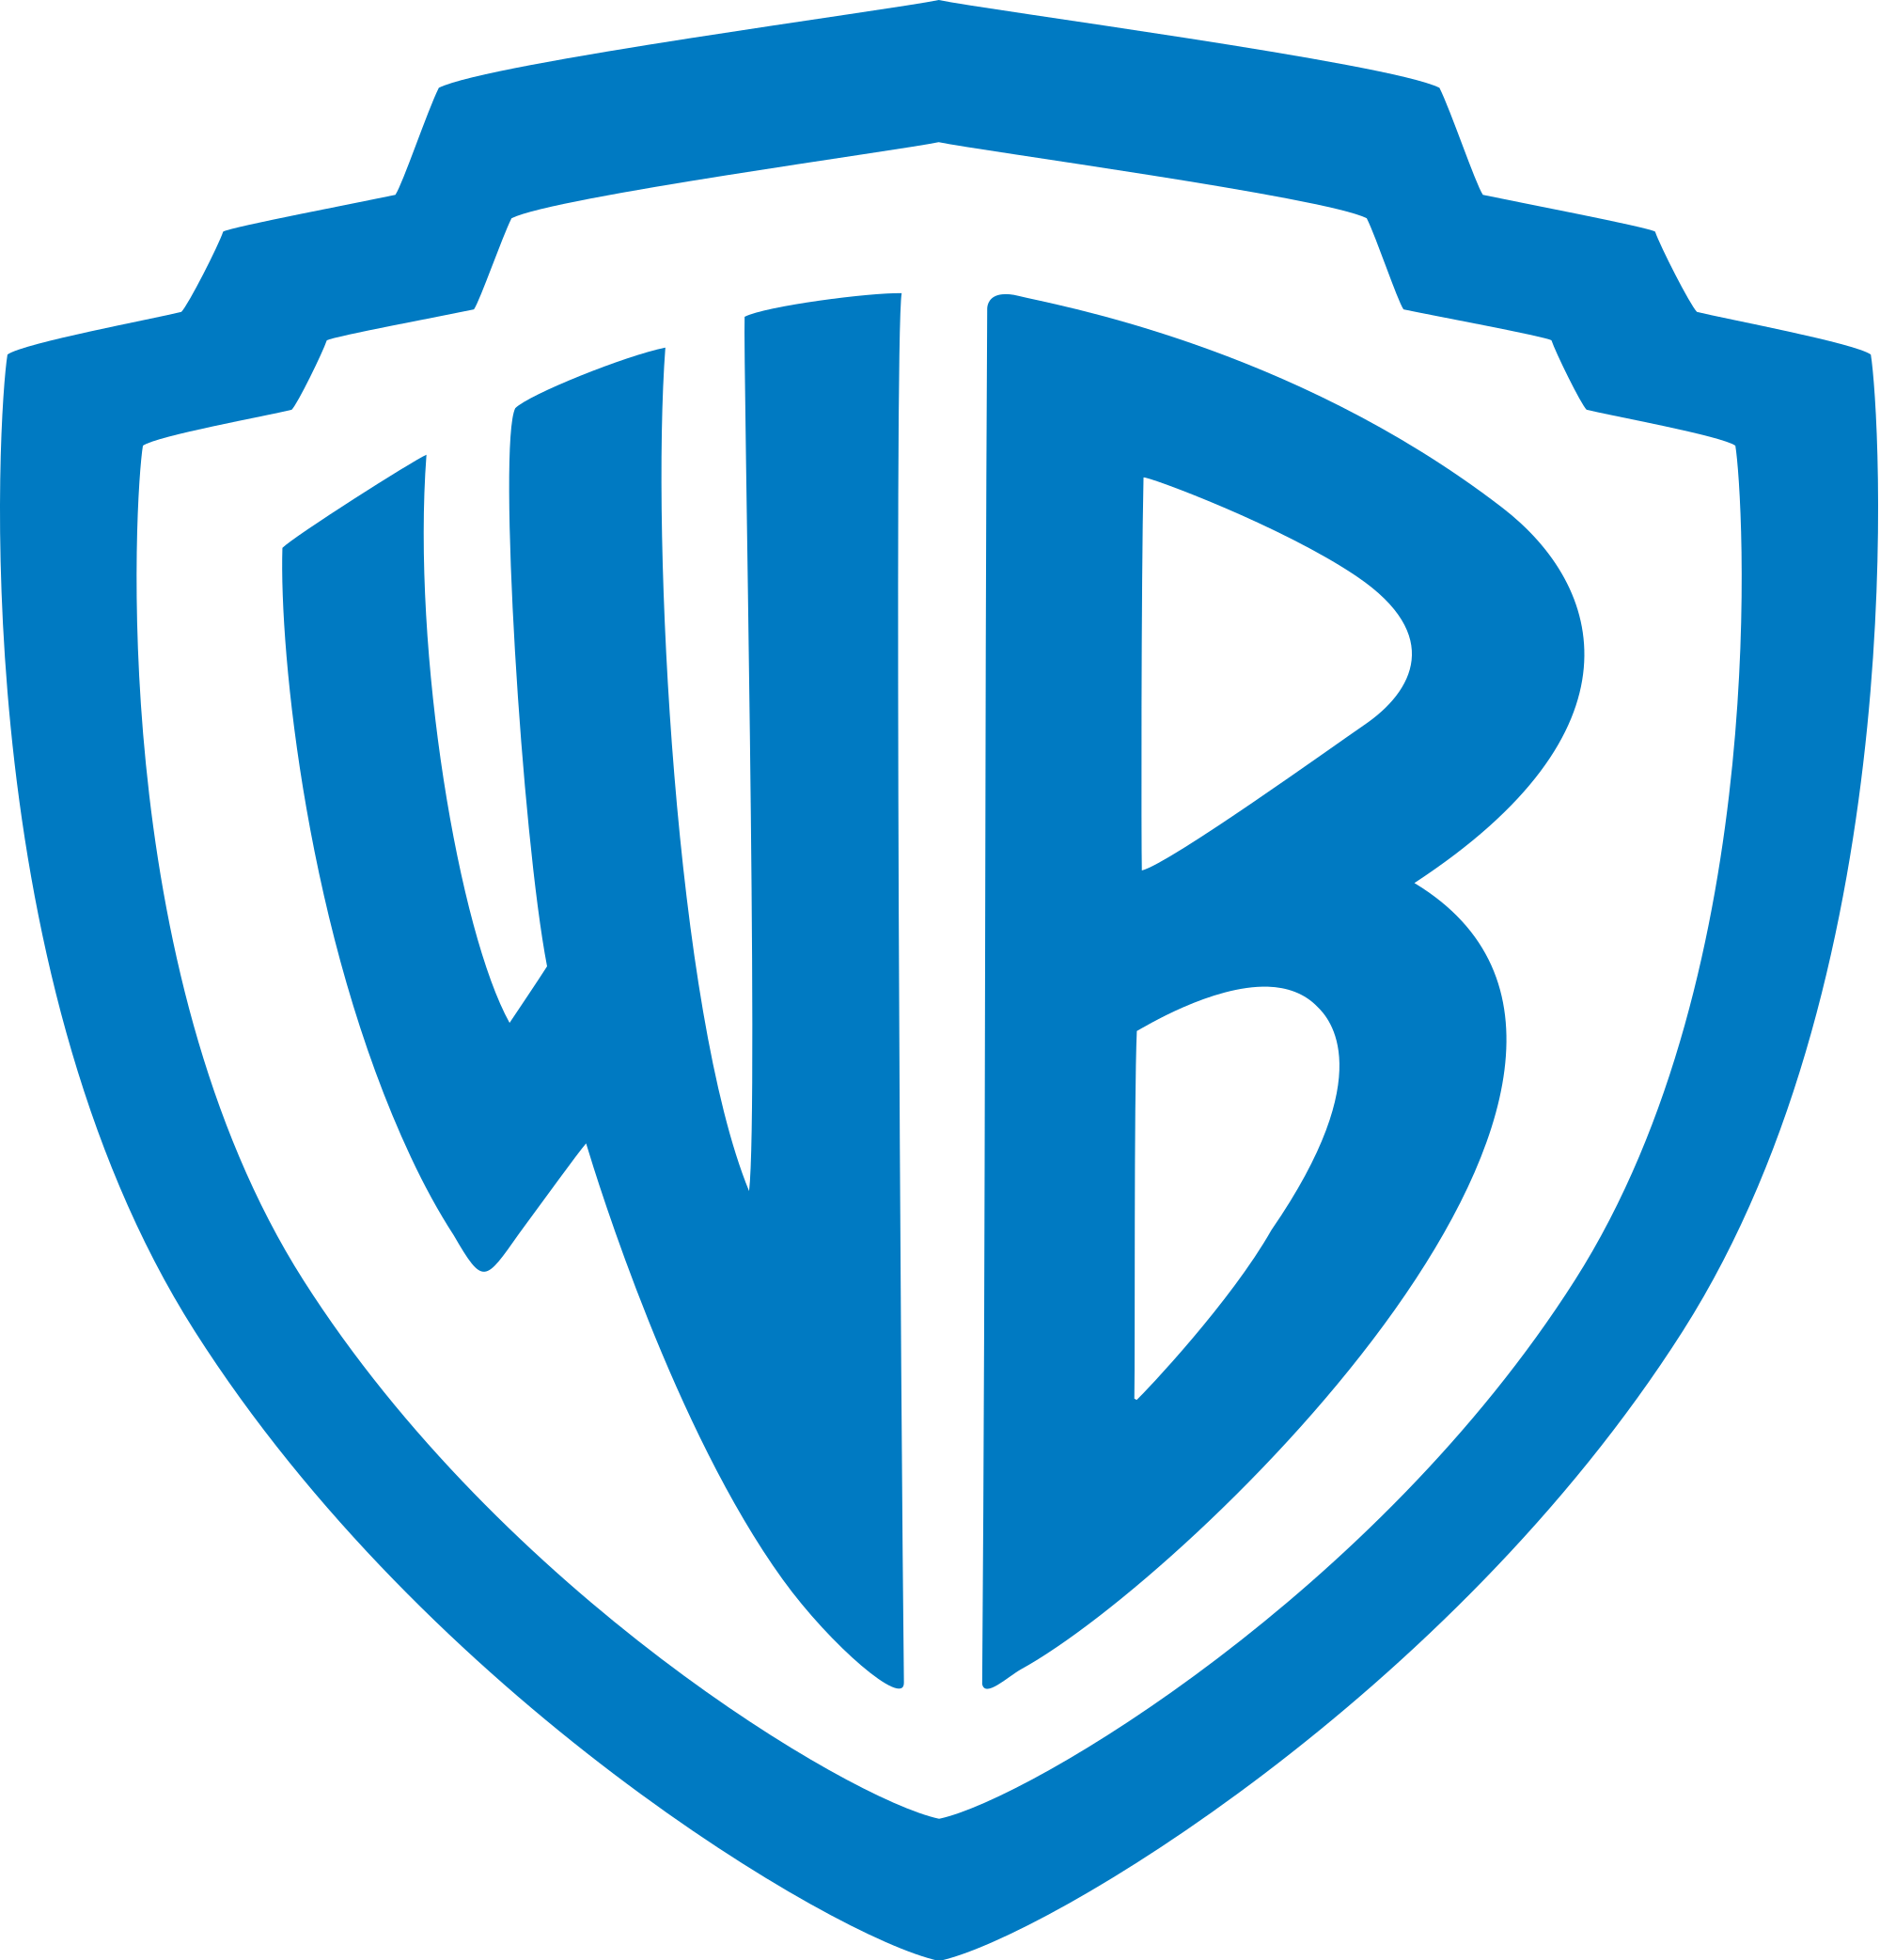 Warner Bros Logo.svg - Warner Bros, Transparent background PNG HD thumbnail